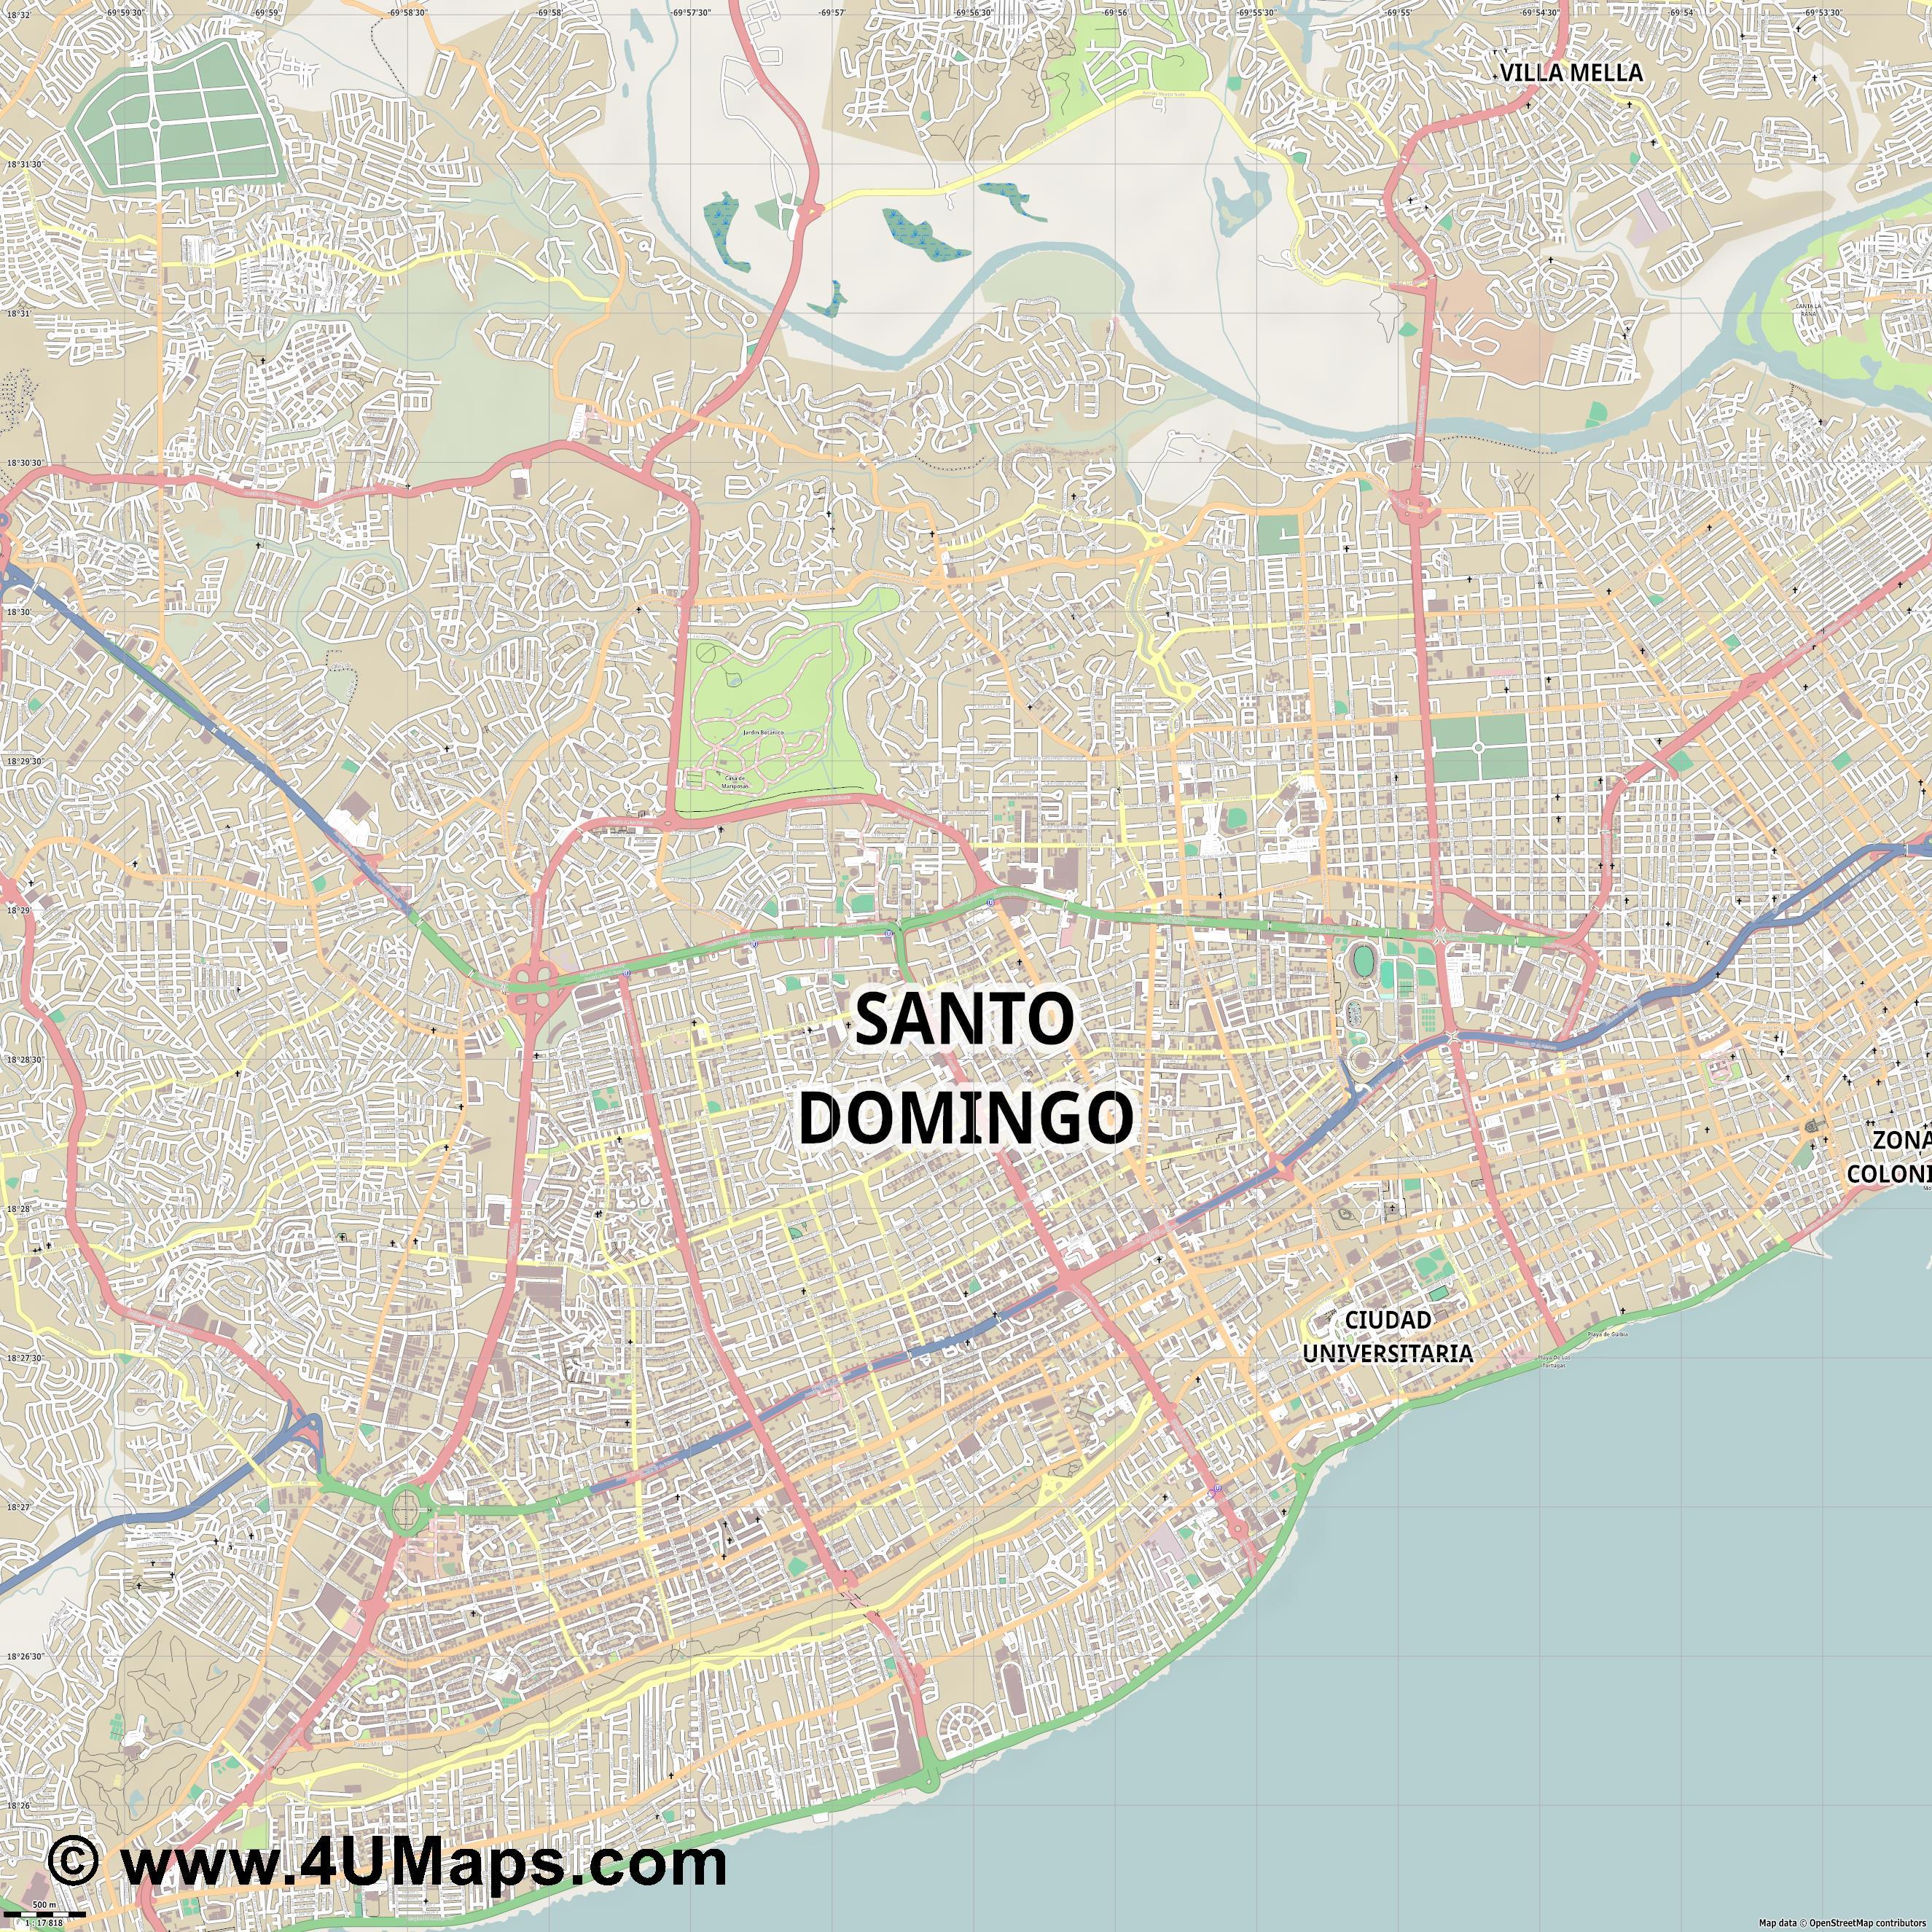 Svg Scalable Vector City Map Santo Domingo - Santo domingo map